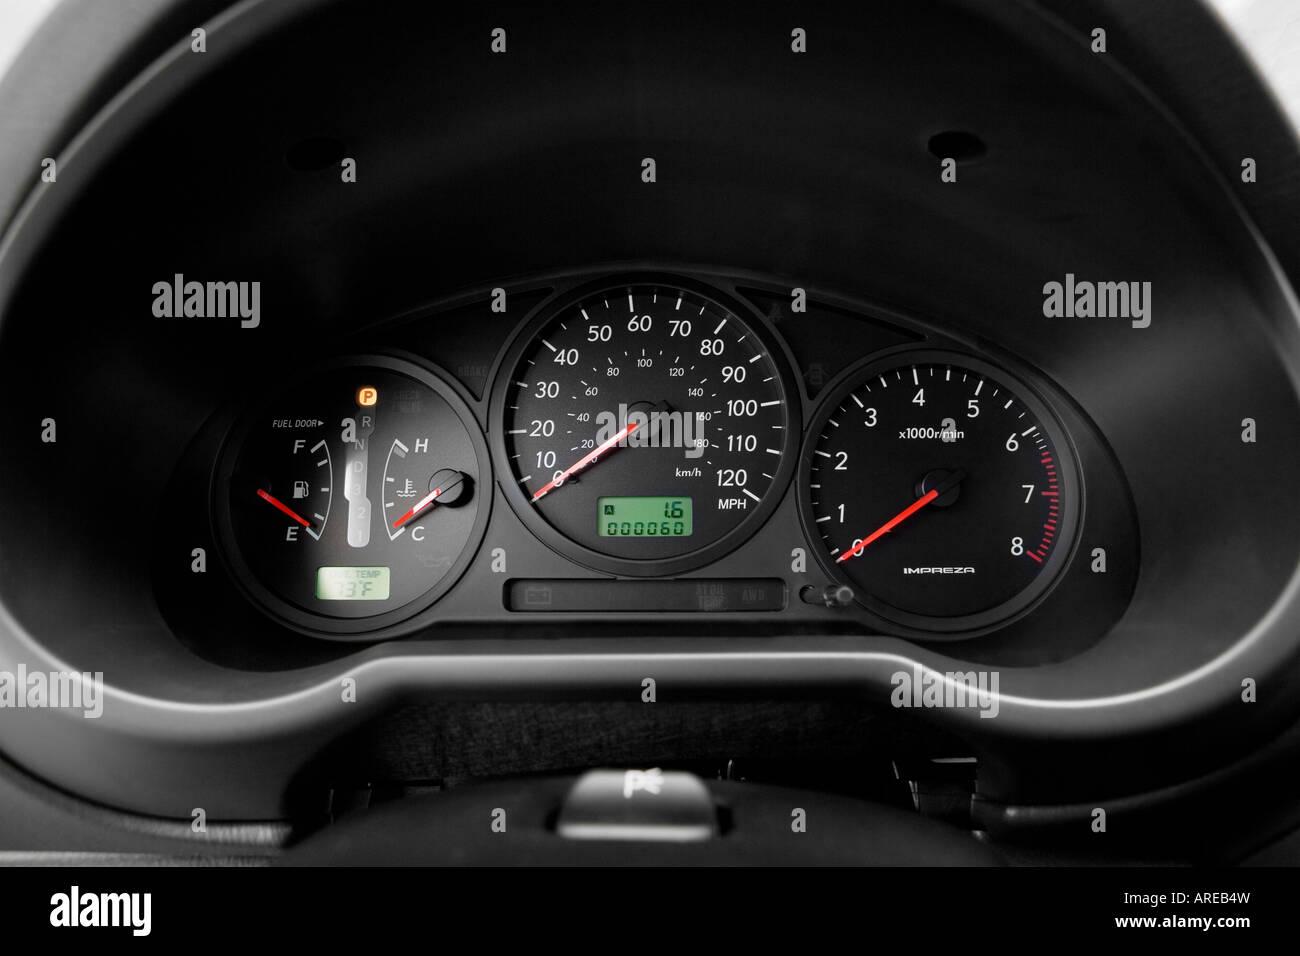 2006 subaru impreza 2.5i in gray - speedometer/tachometer stock